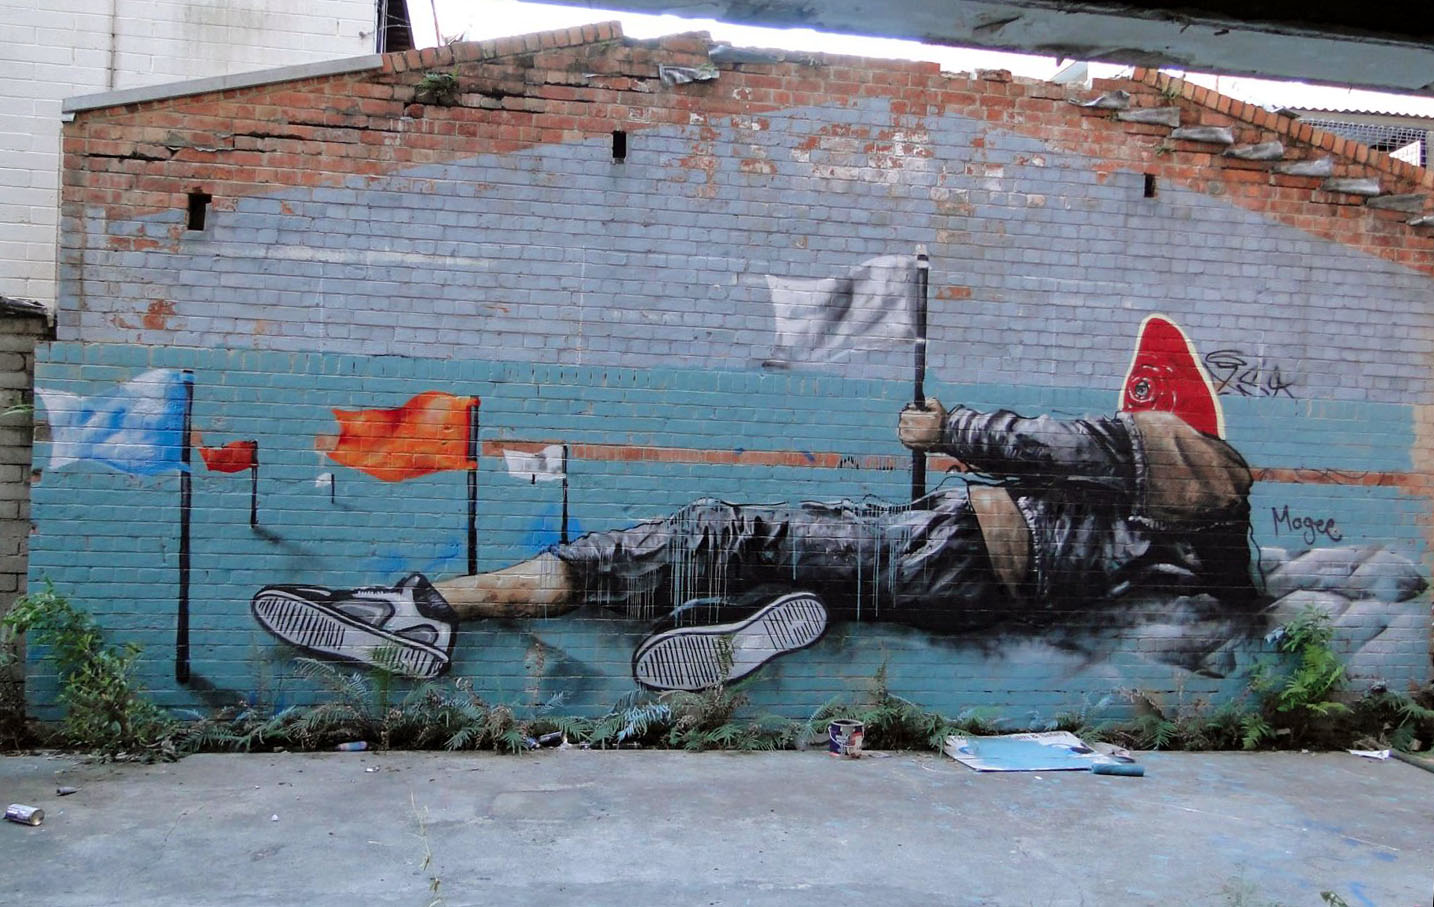 Fintan magee new murals in brisbane australia for Australian mural